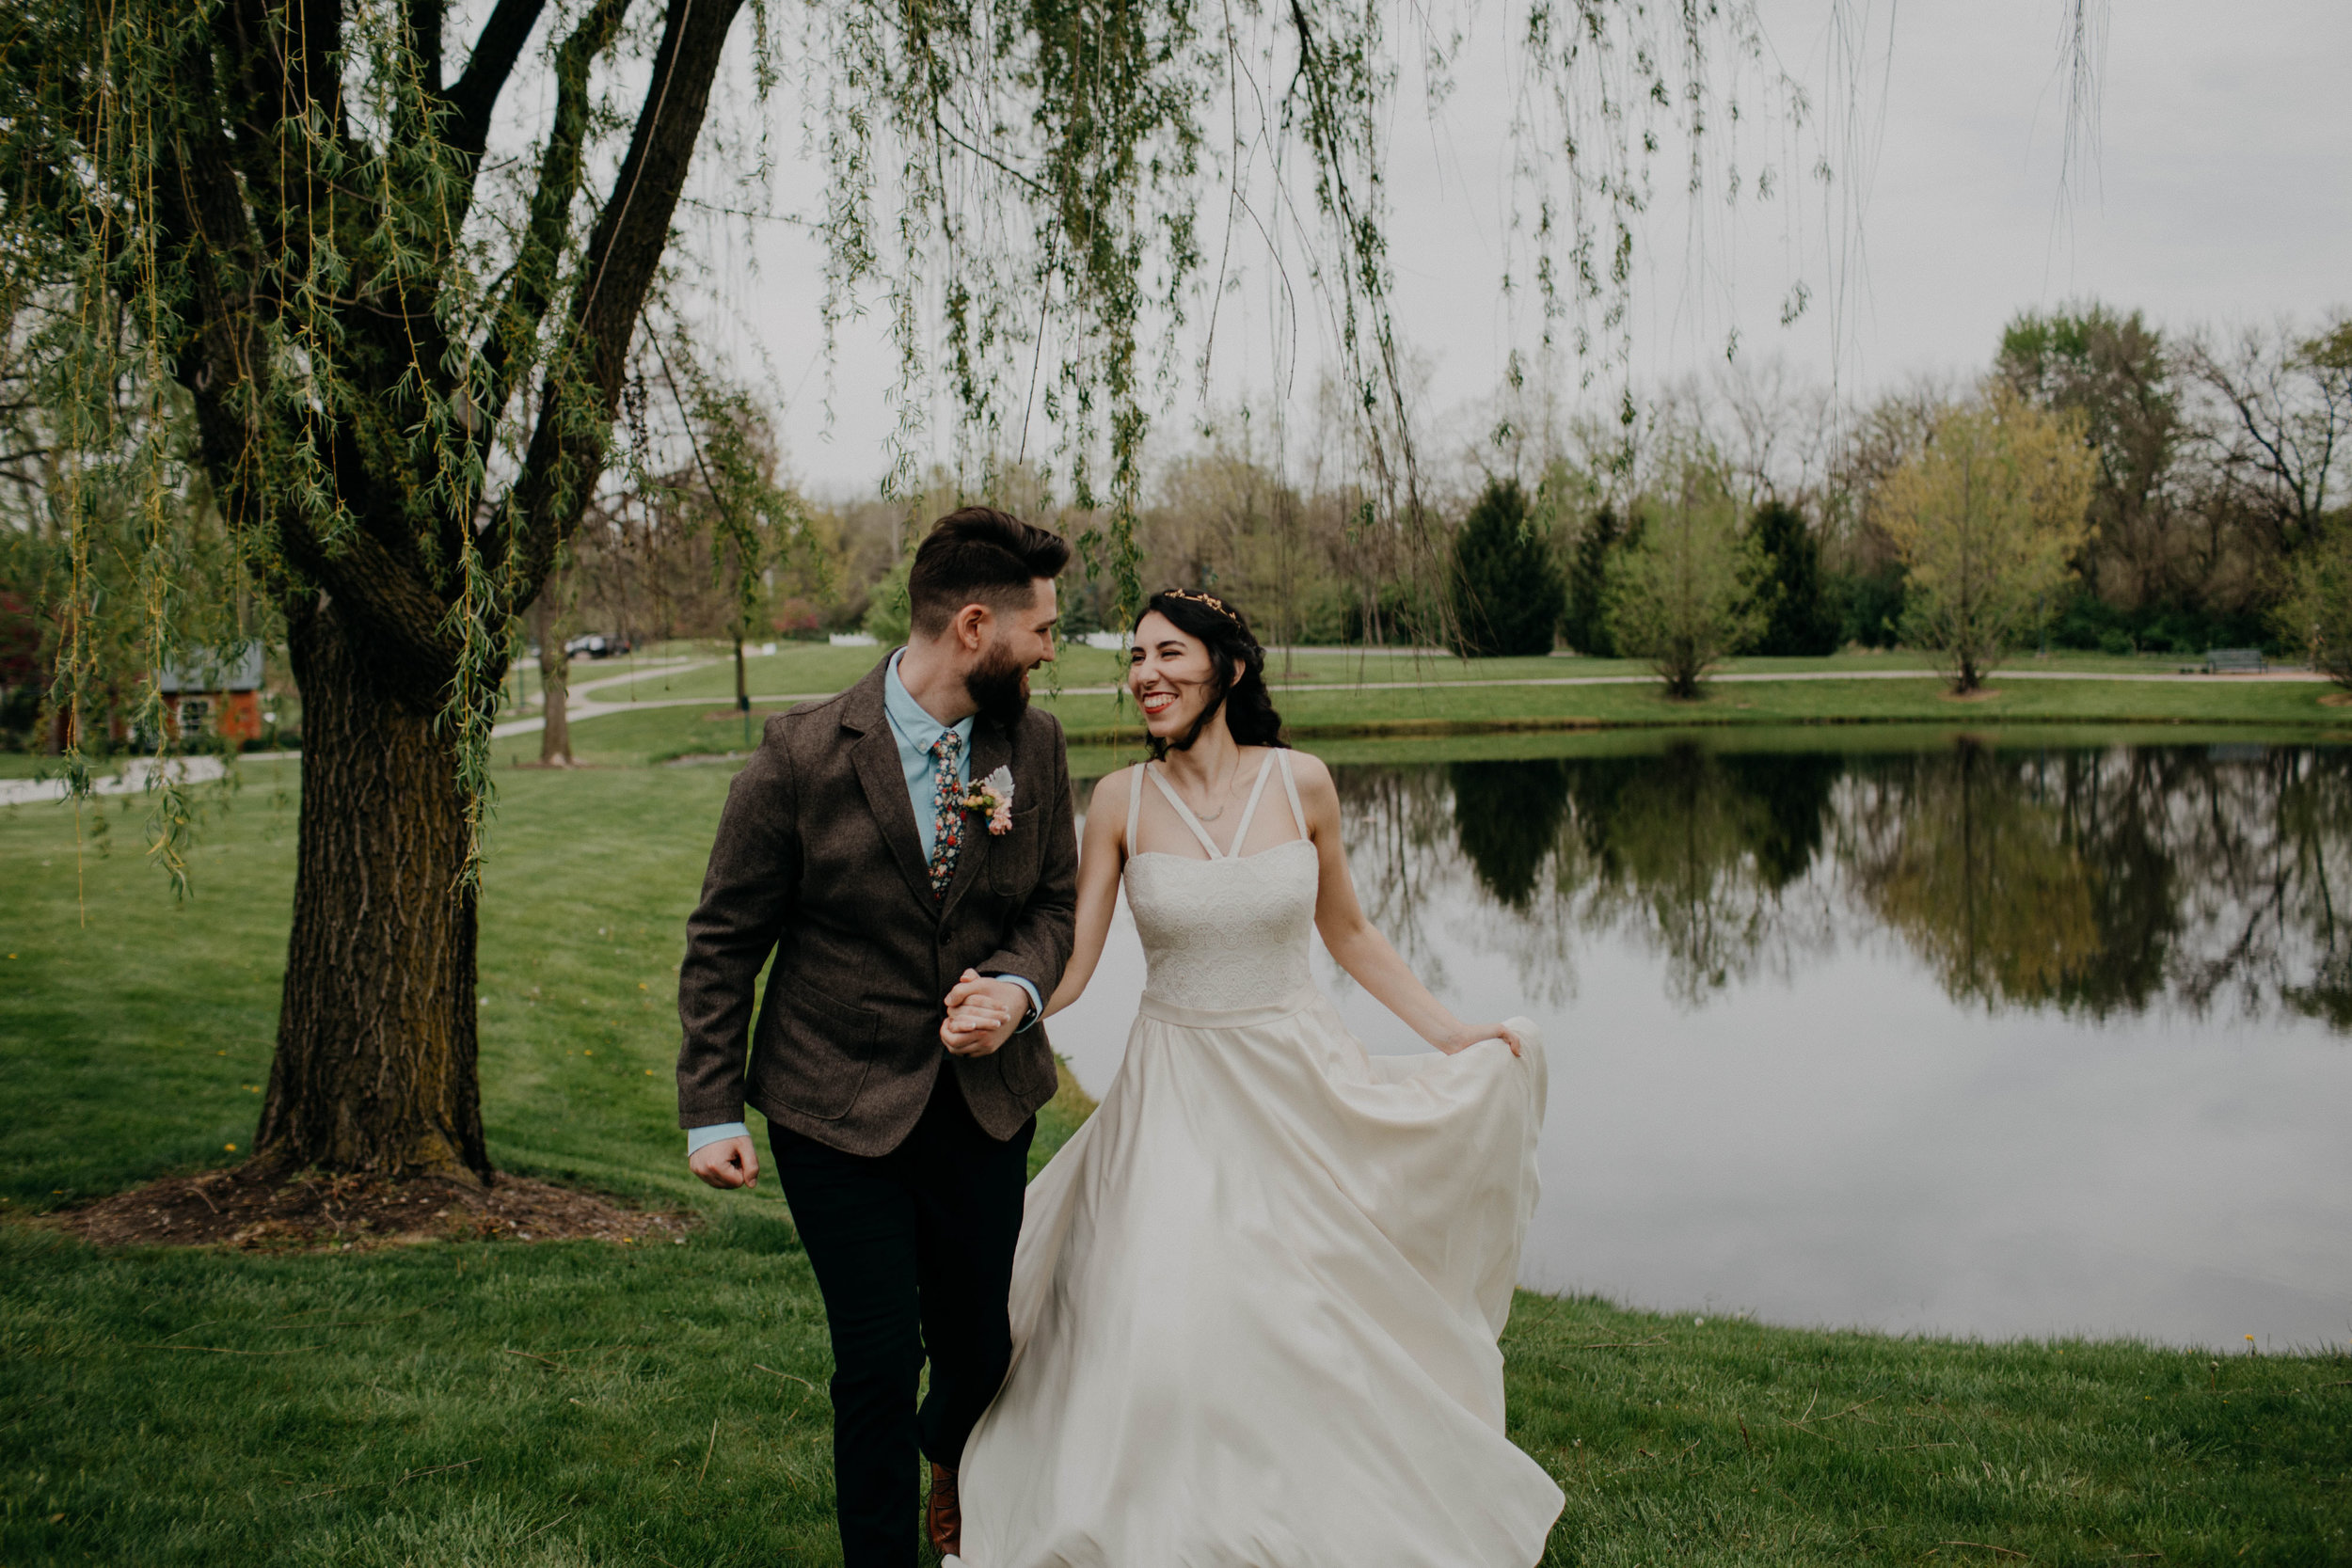 Columbus, Ohio Wedding Photographer Everal Barn At Heritage Park Wedding Venue Grace E Jones Photography152.jpg